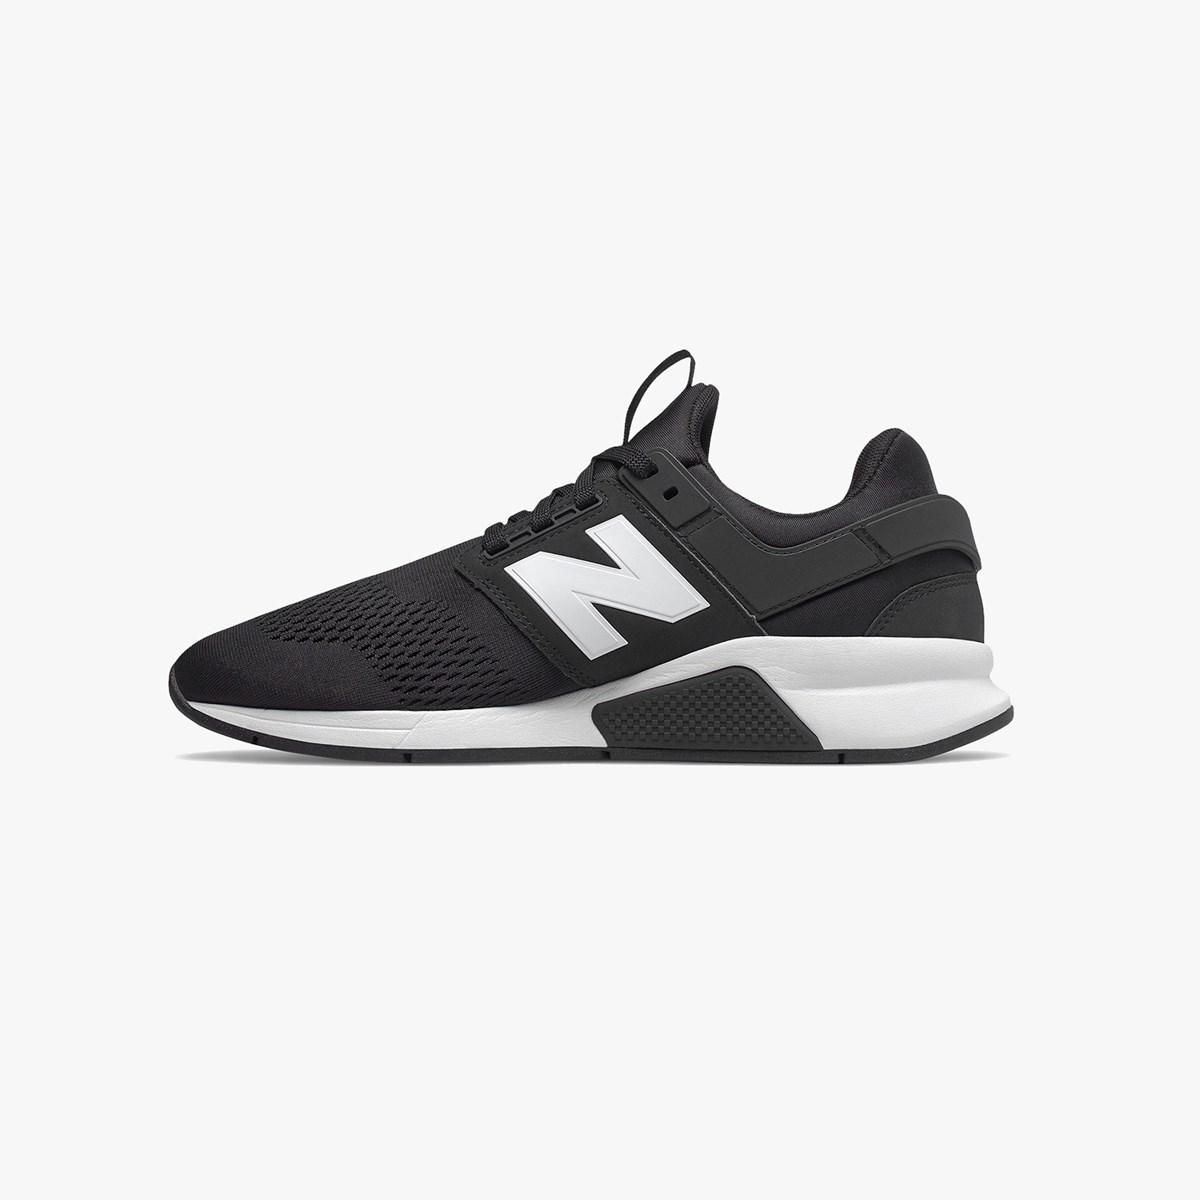 New Balance 247 - Ms247eb - SNS   sneakers & streetwear online since 1999